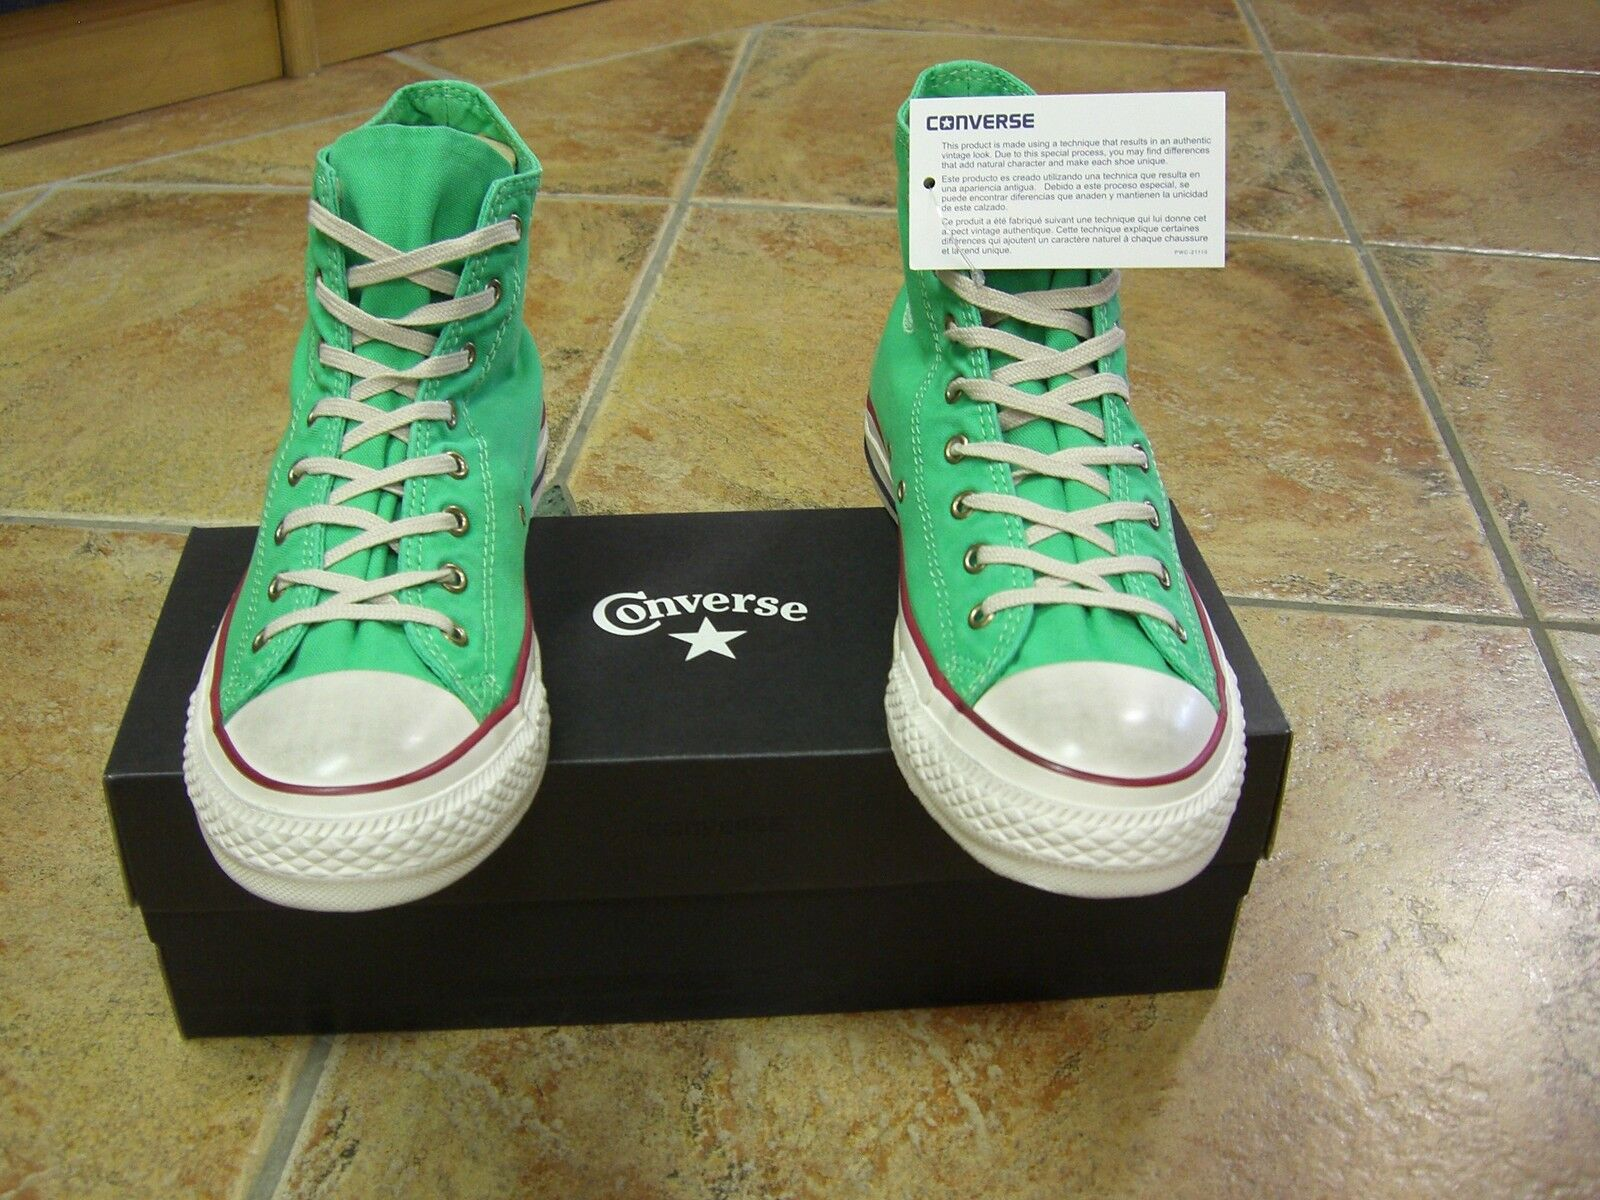 Converse Chucks All Star Gr. 37 HI DEEP MINT 136888C  NEU Top aktuell